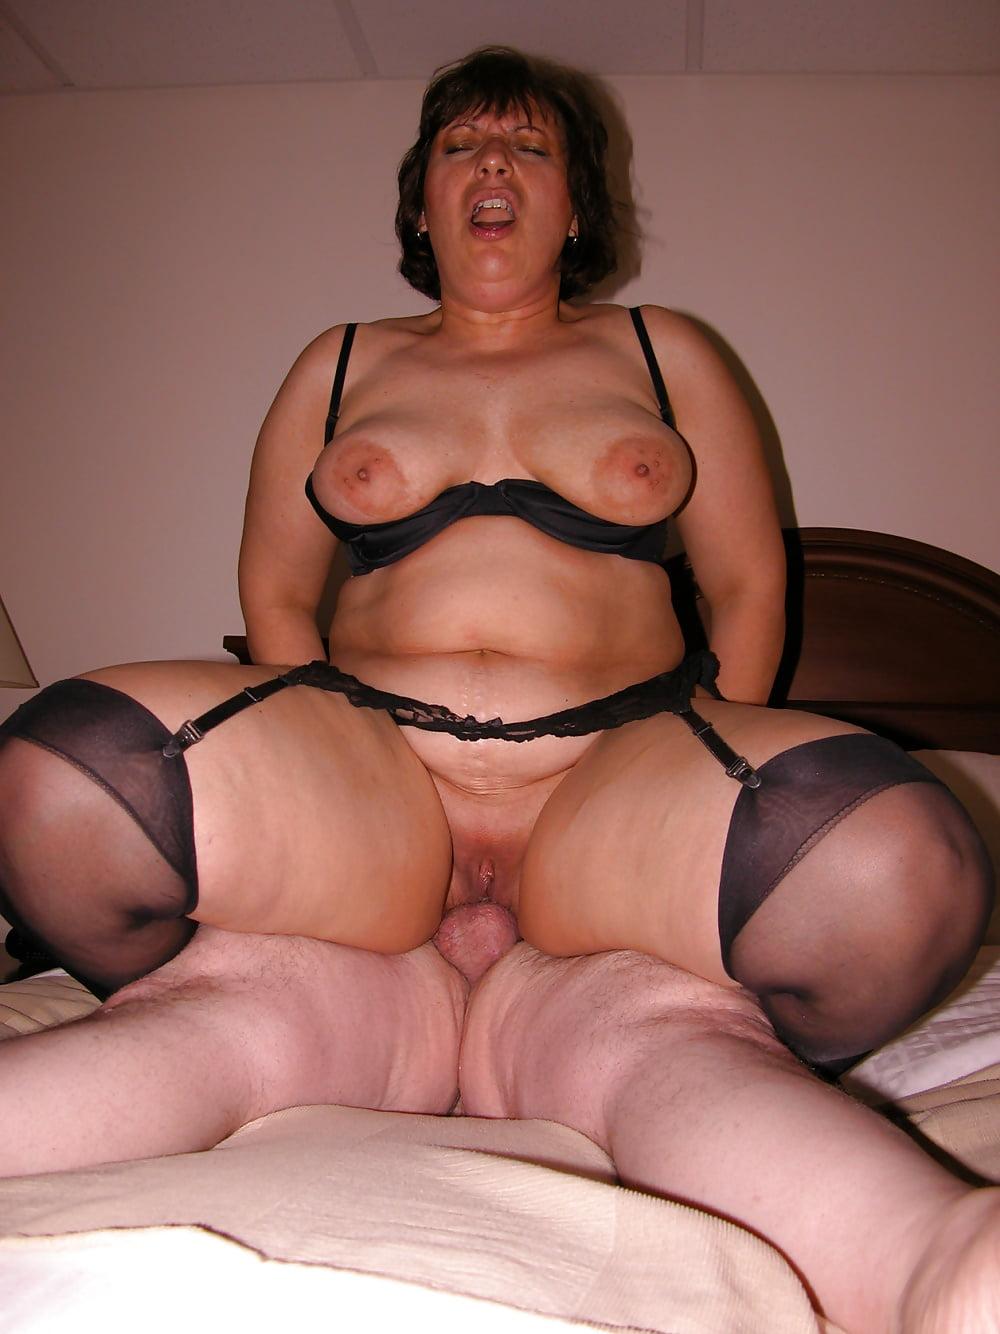 Nasty mature fat sex porn galleries